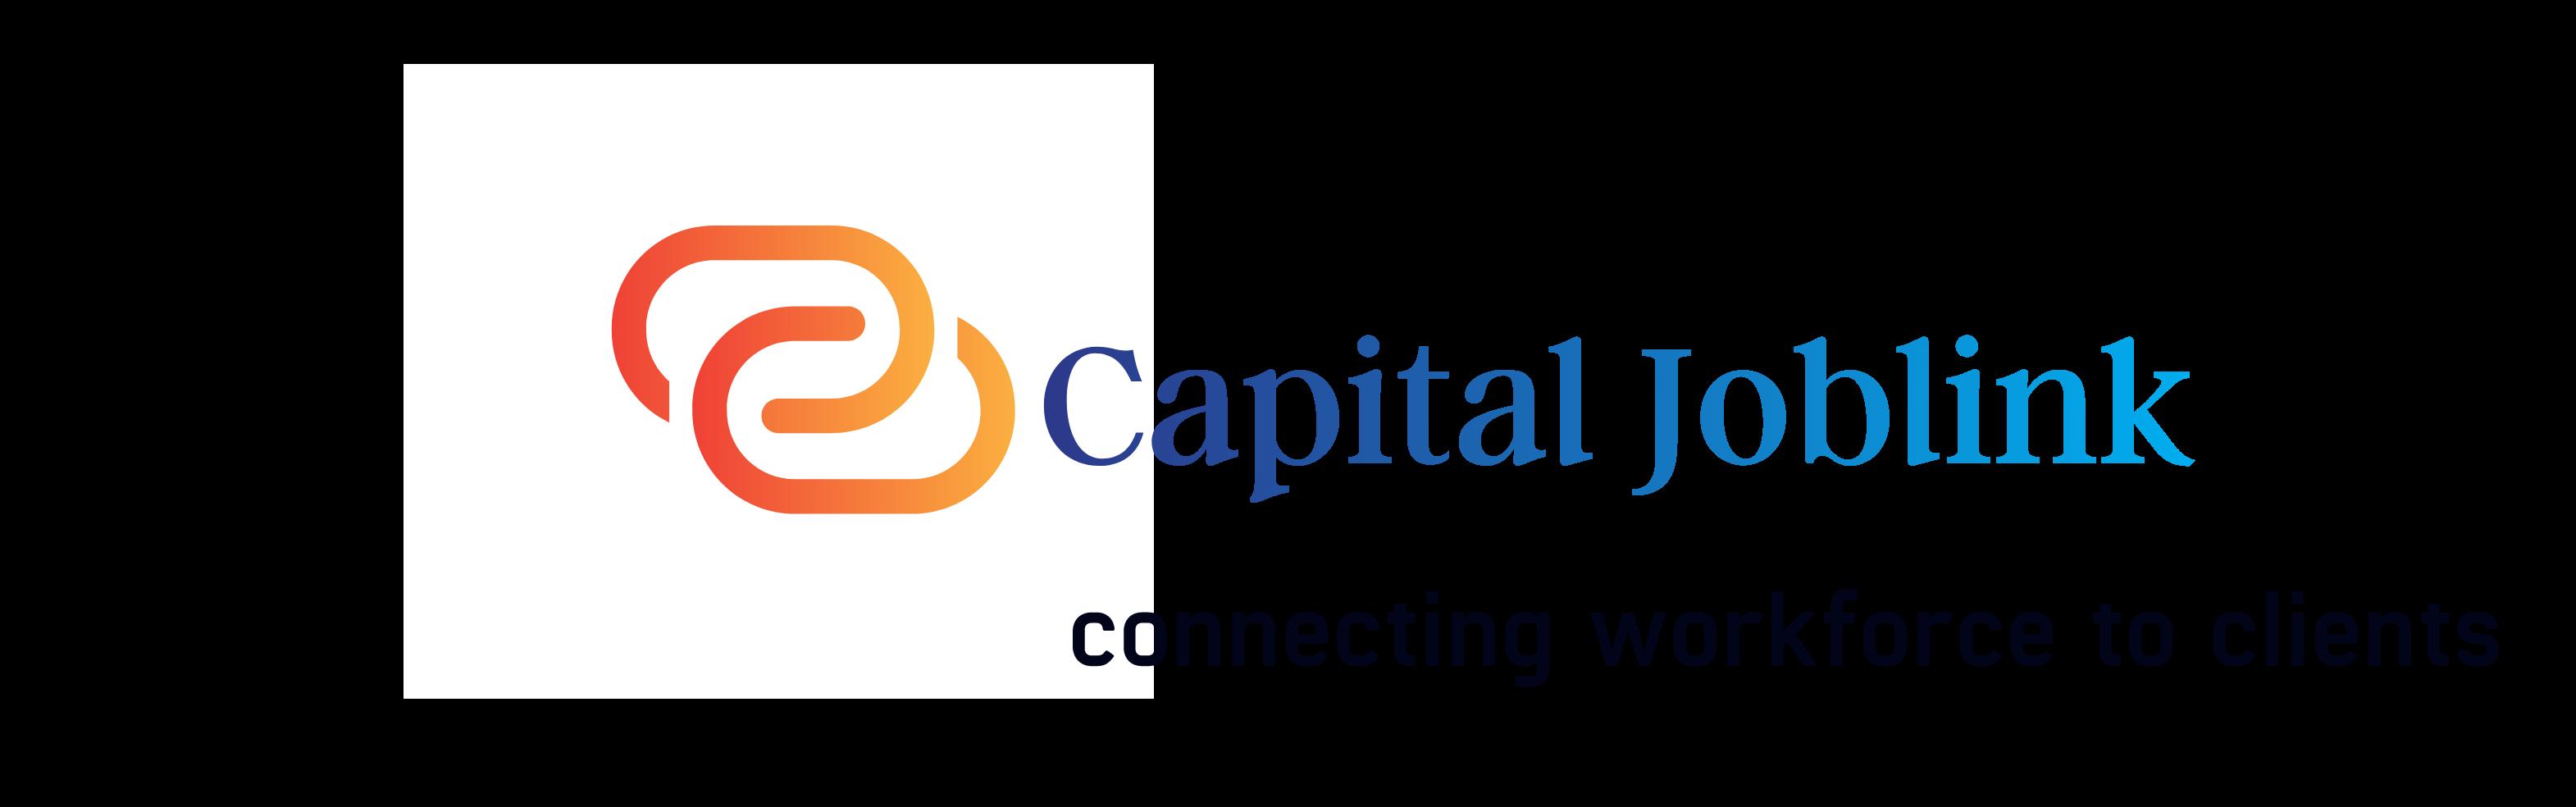 Capital Joblink